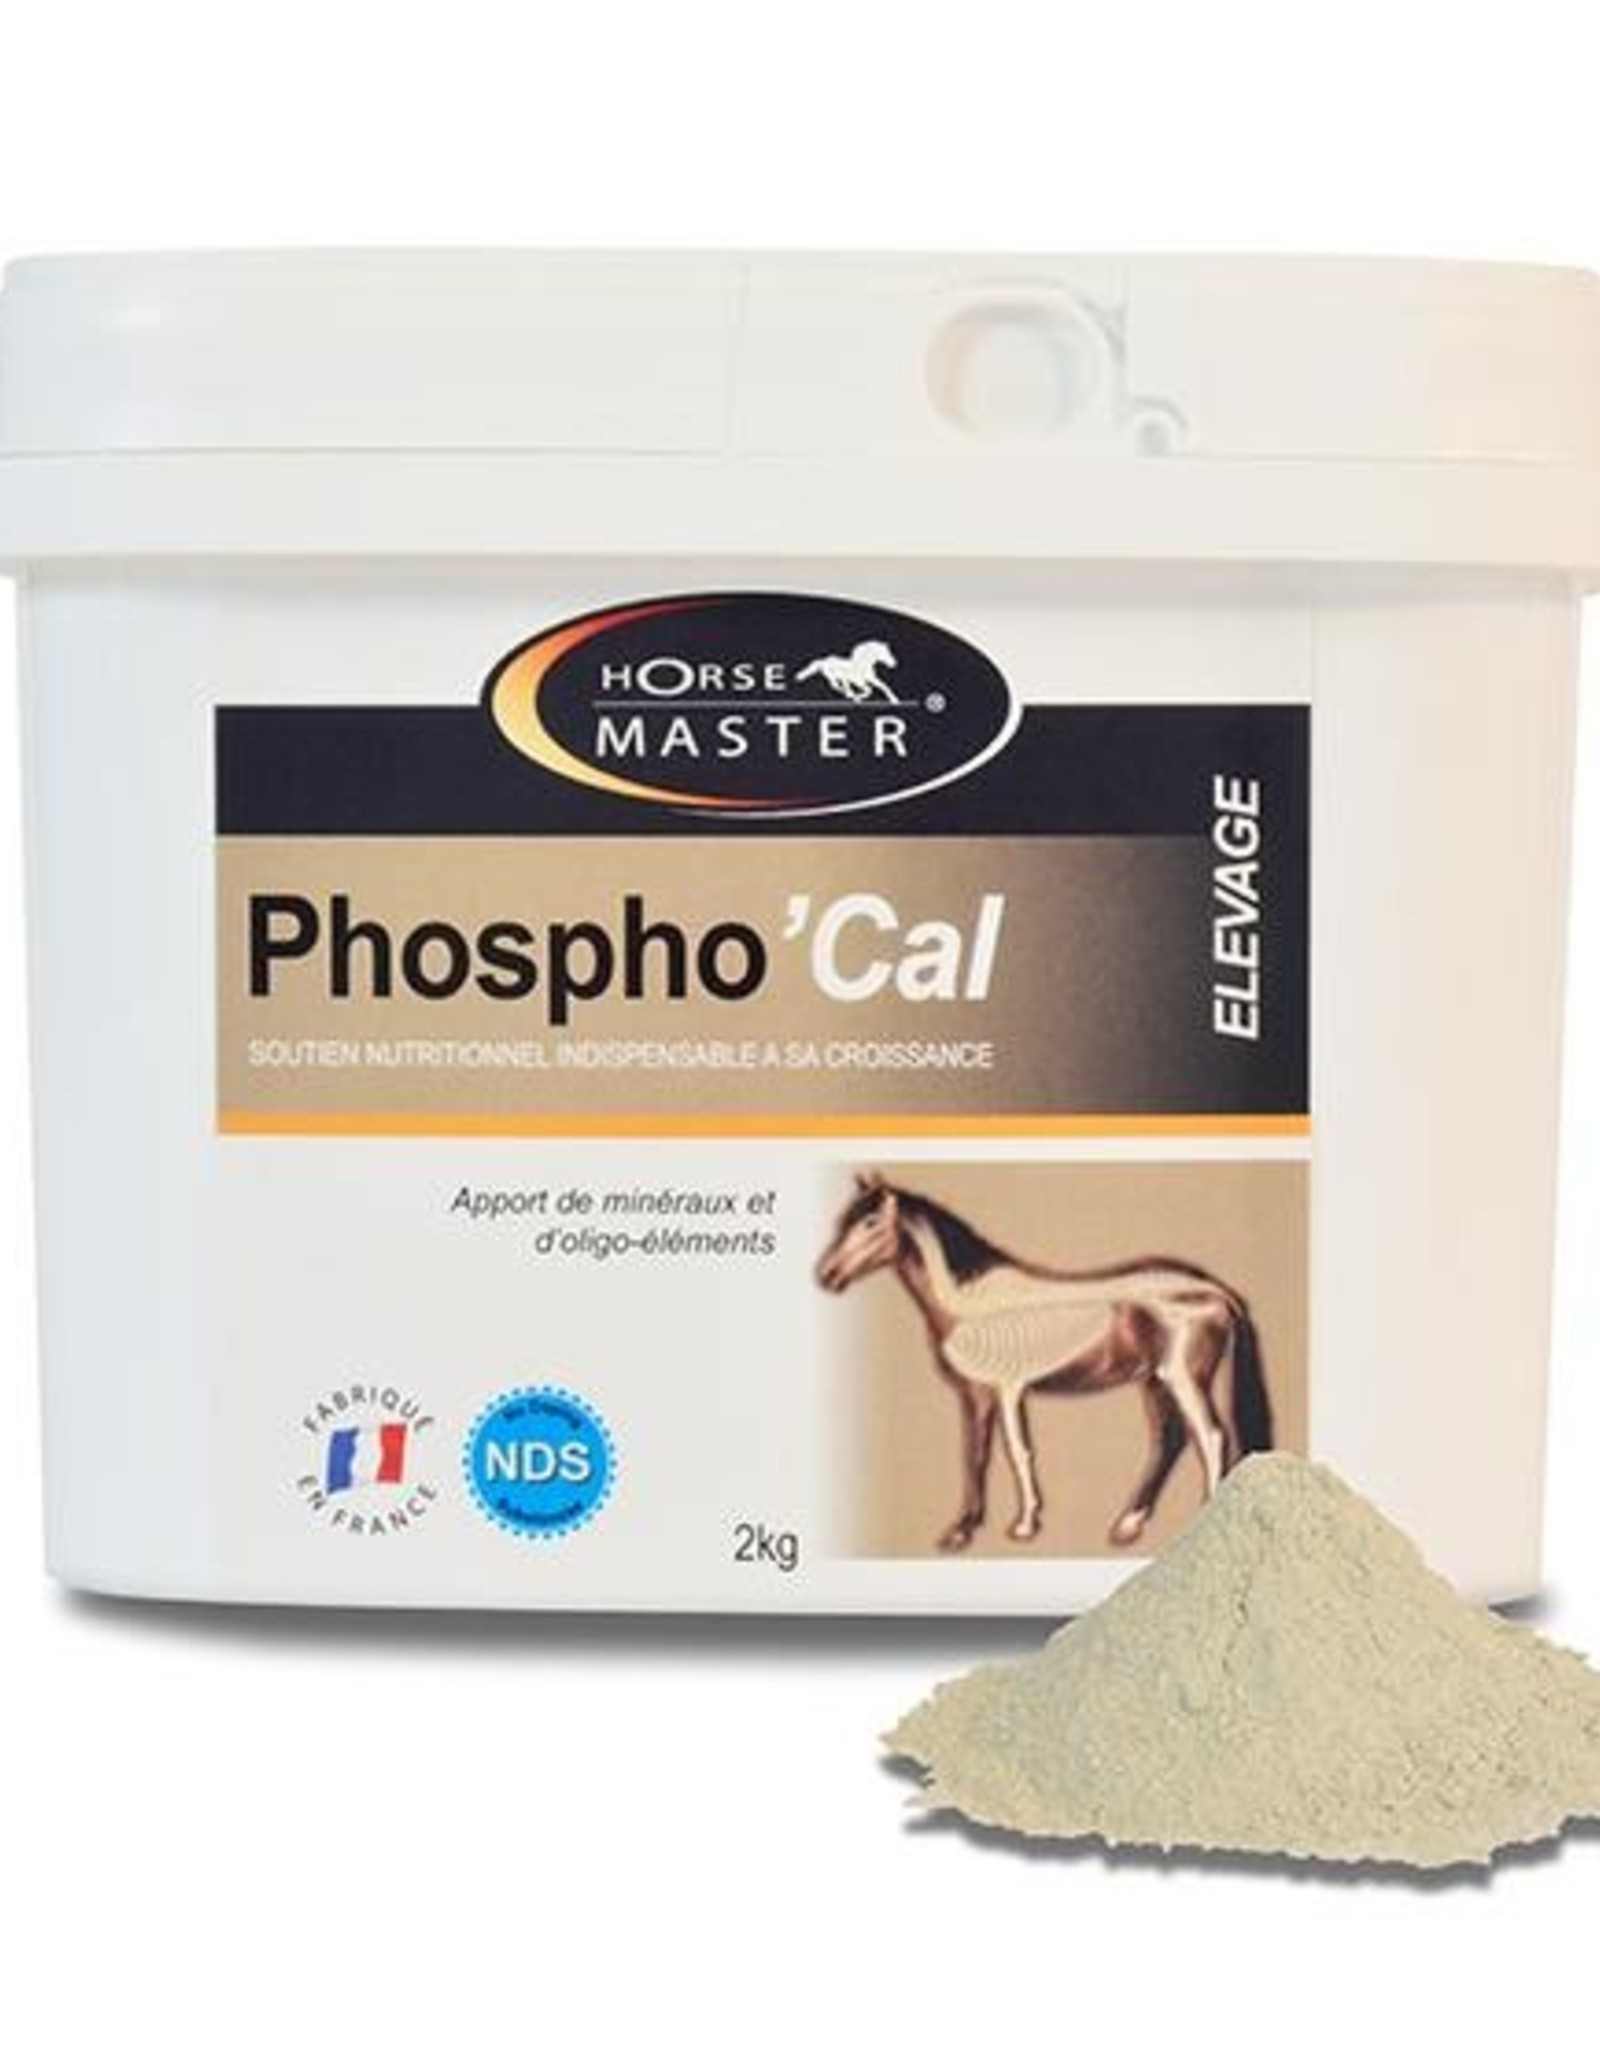 Horse Master Phospho'Cal